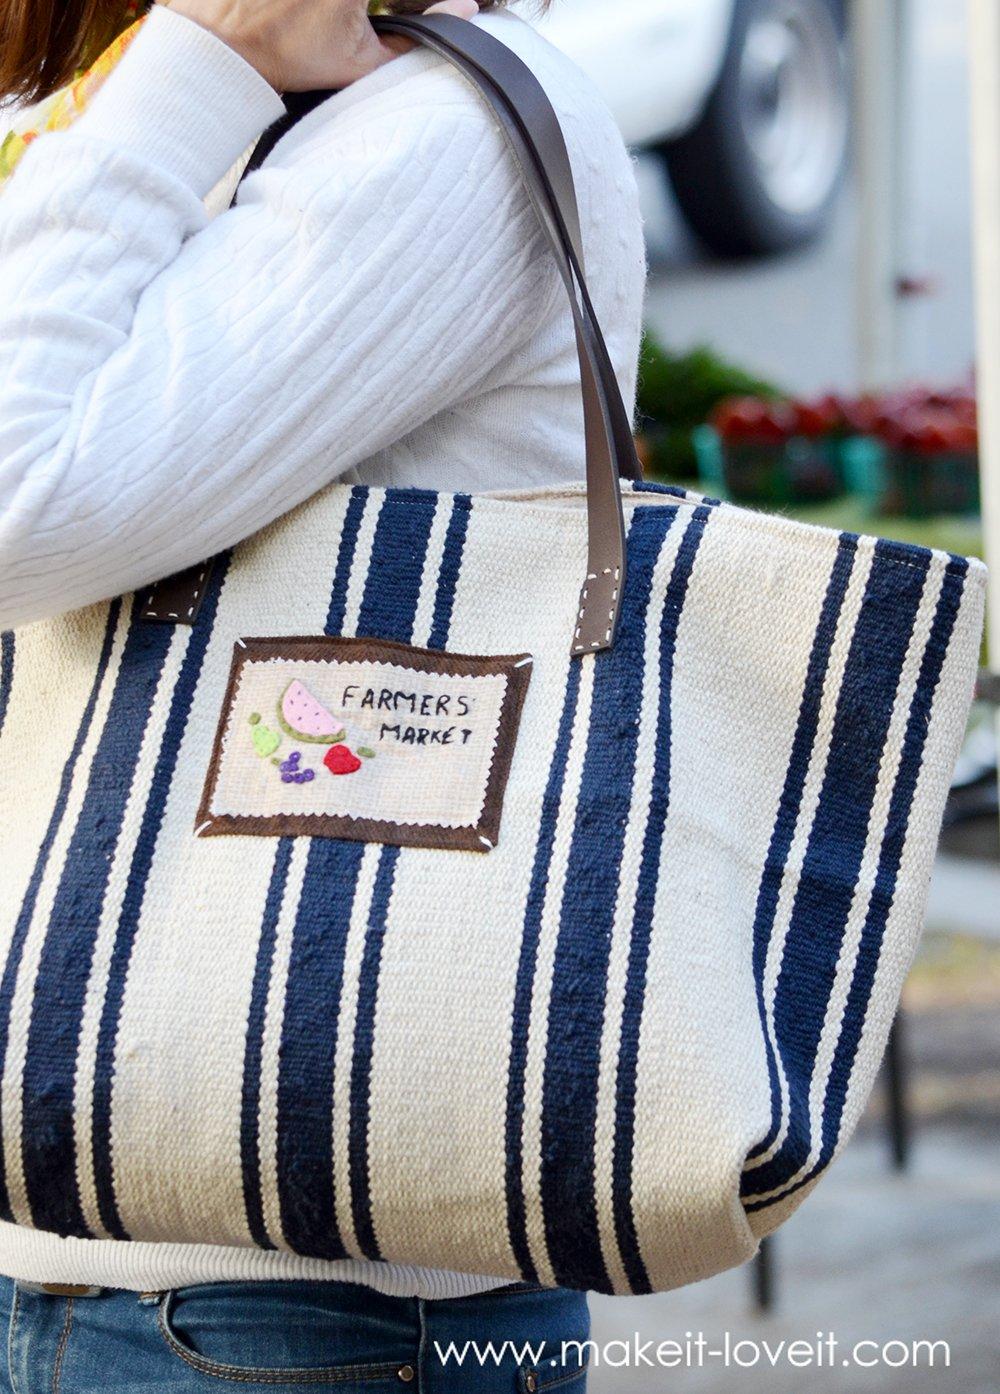 Farmers' market bag (from an ikea rug)